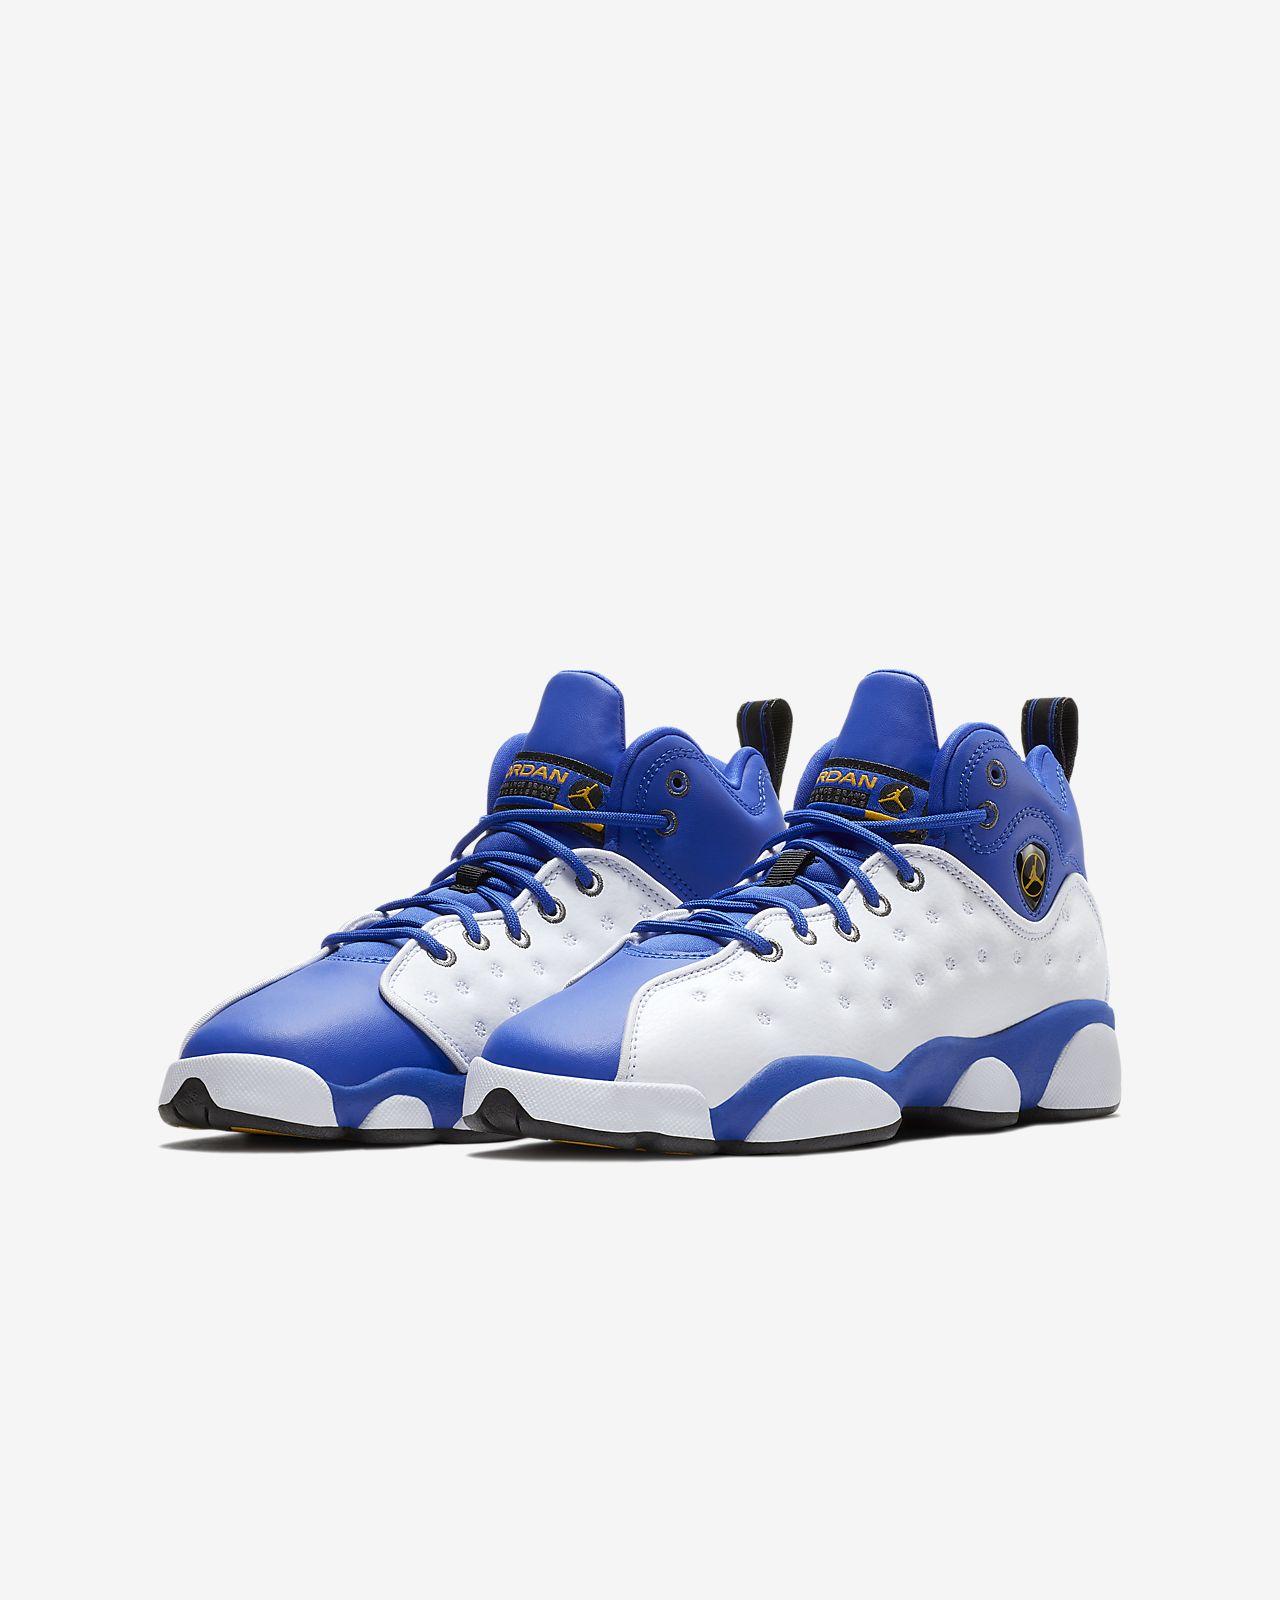 sale retailer 07140 3302f ... promo code for jordan jumpman team ii 3.5y 7y big kids shoe ae8c4 384e2